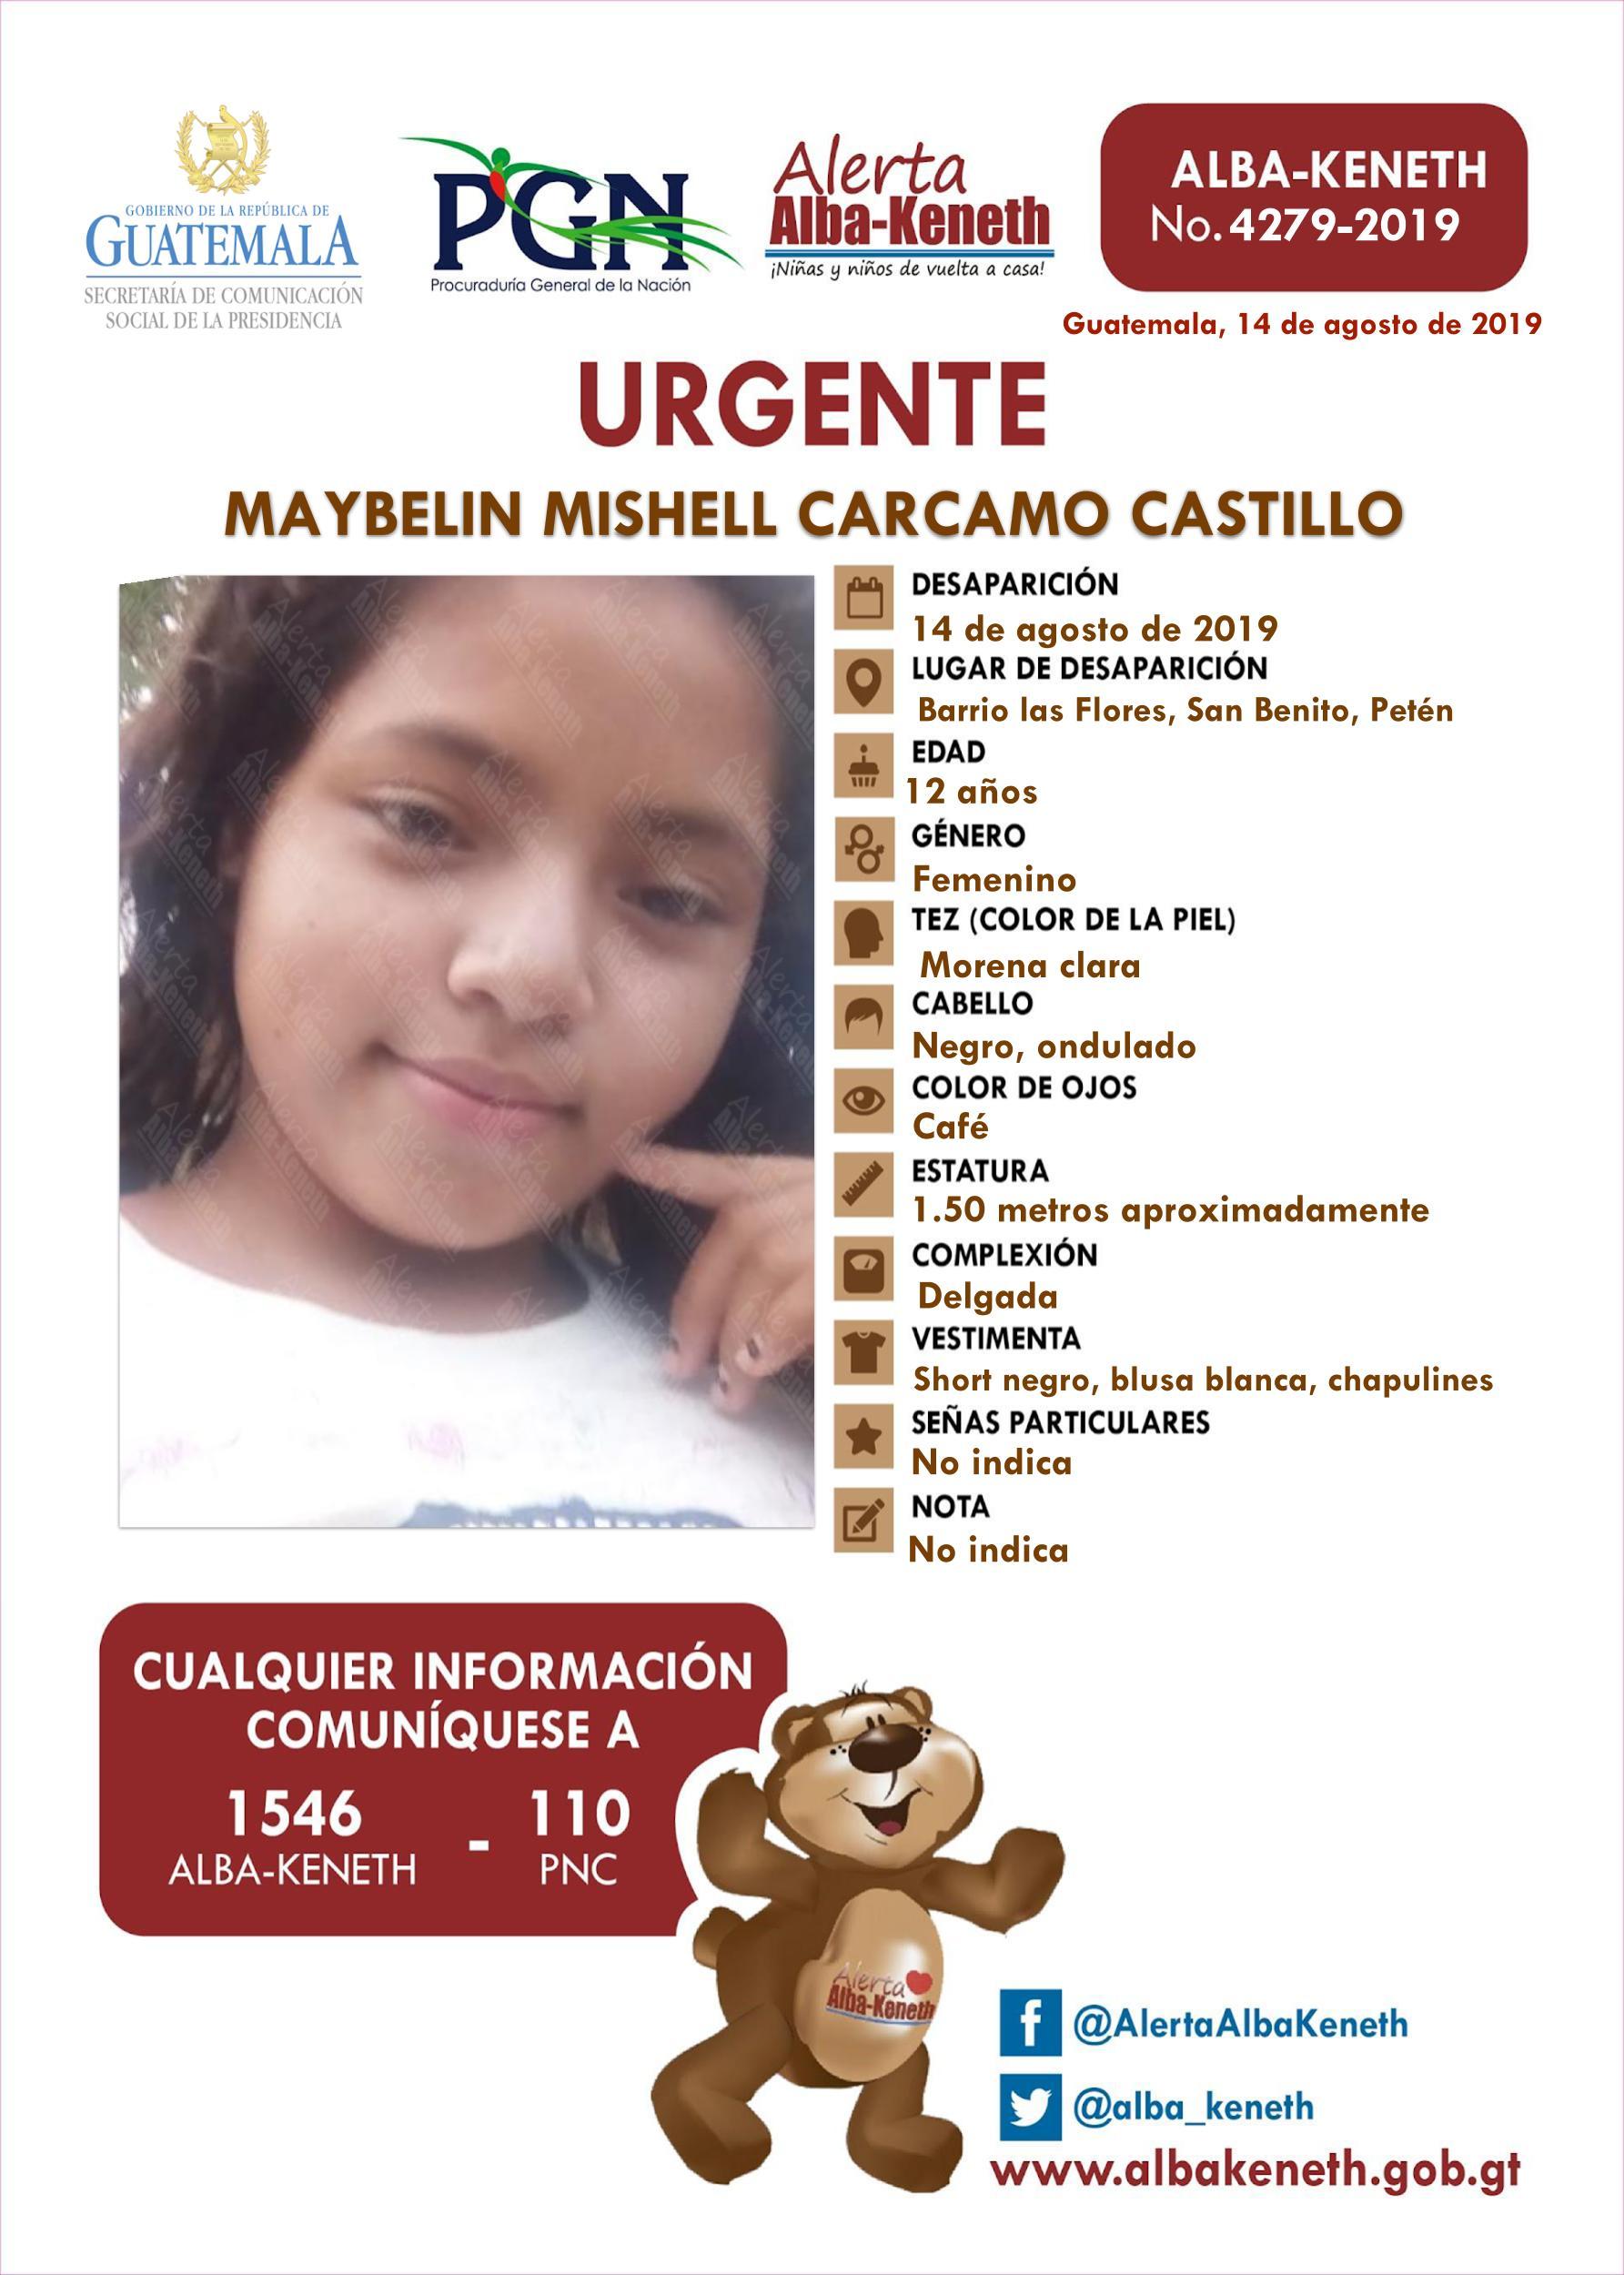 Maybelin Mishell Carcamo Castillo